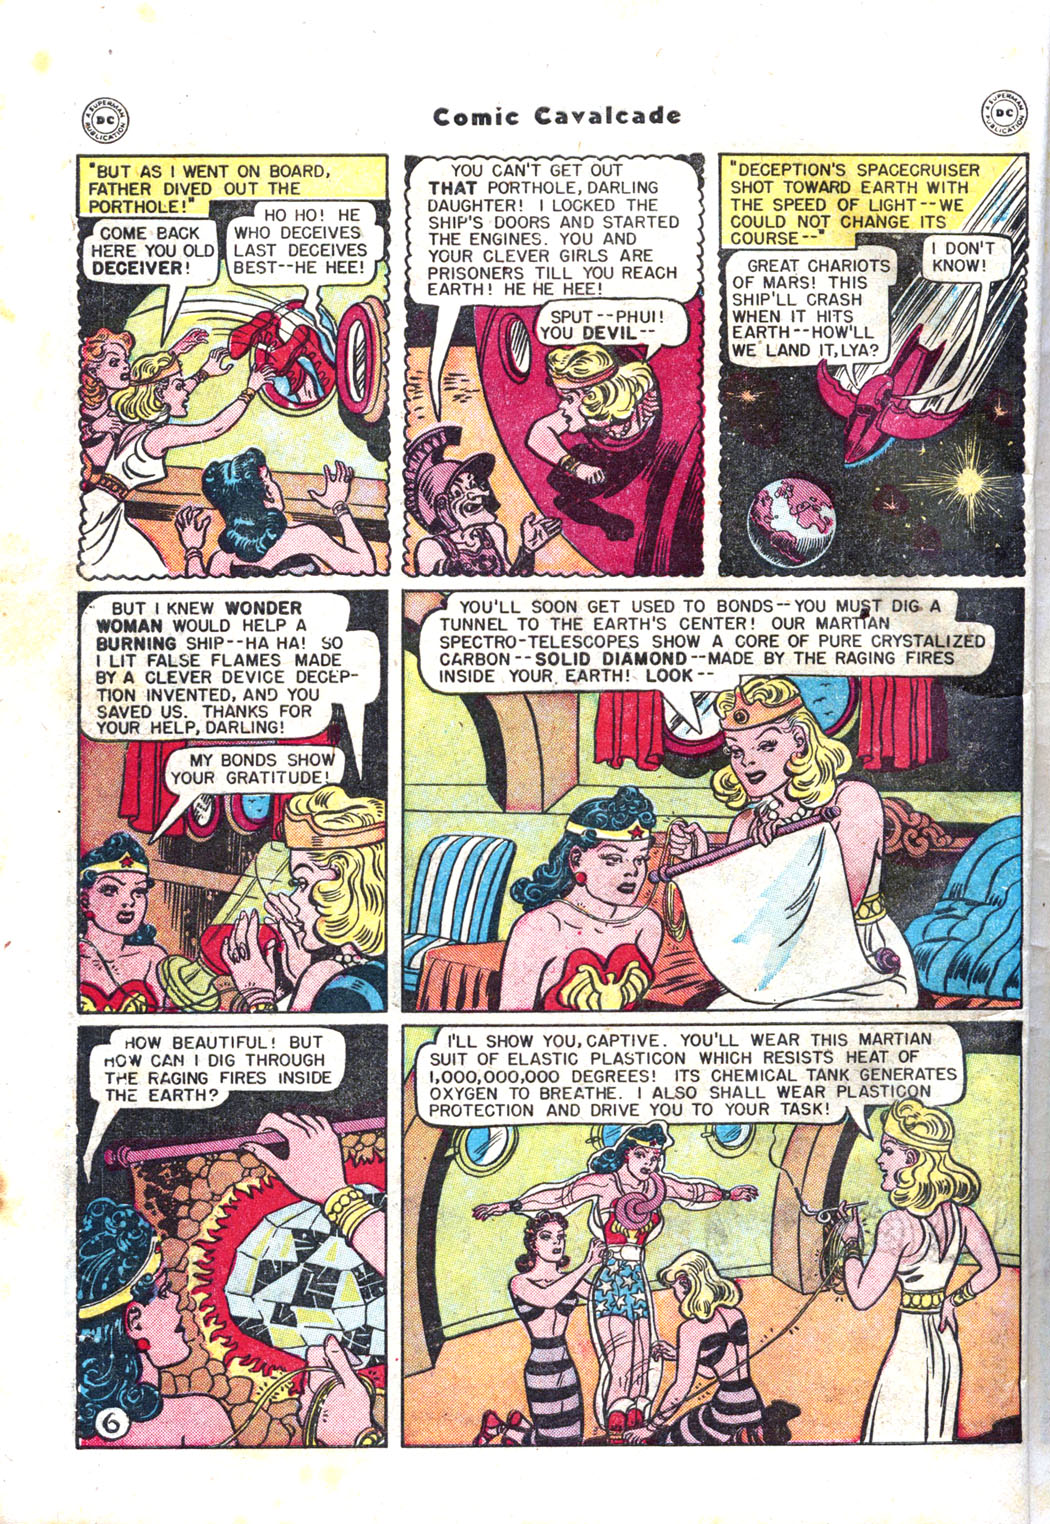 Comic Cavalcade issue 26 - Page 8